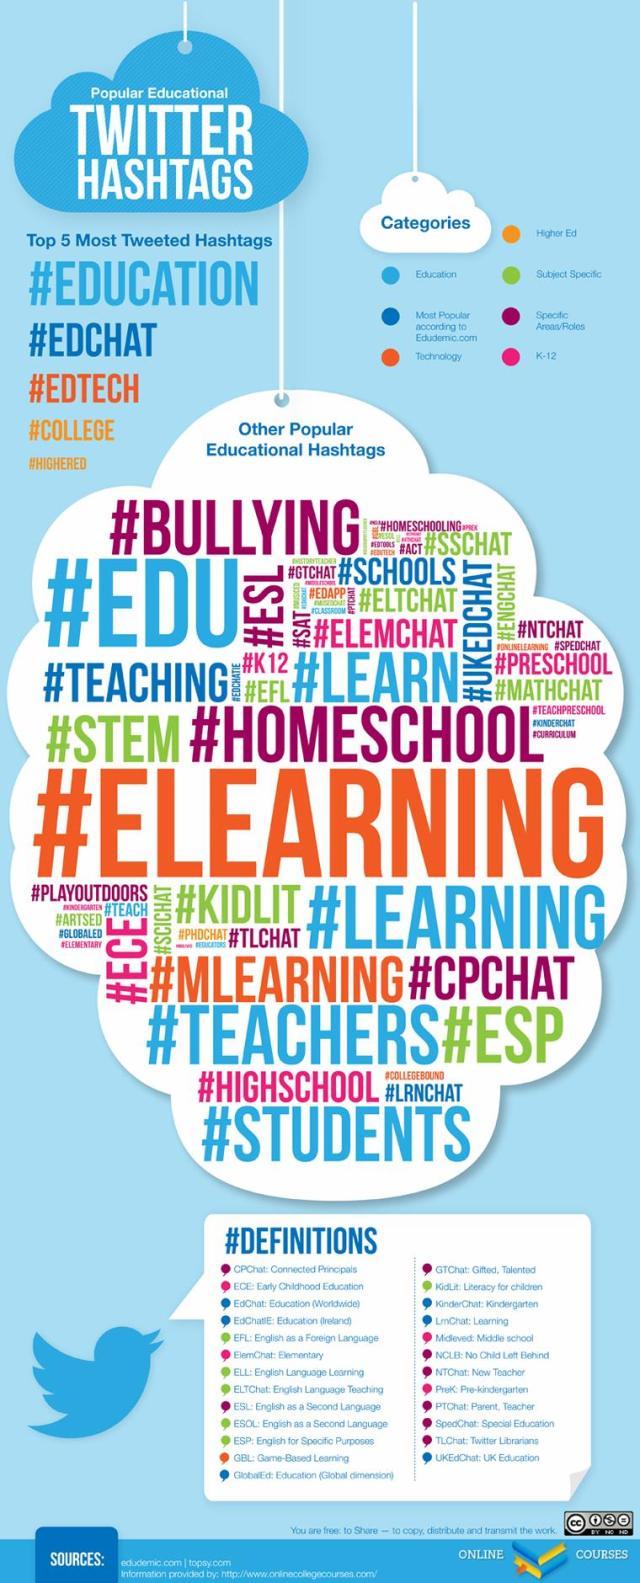 Popular Educational Hashtag